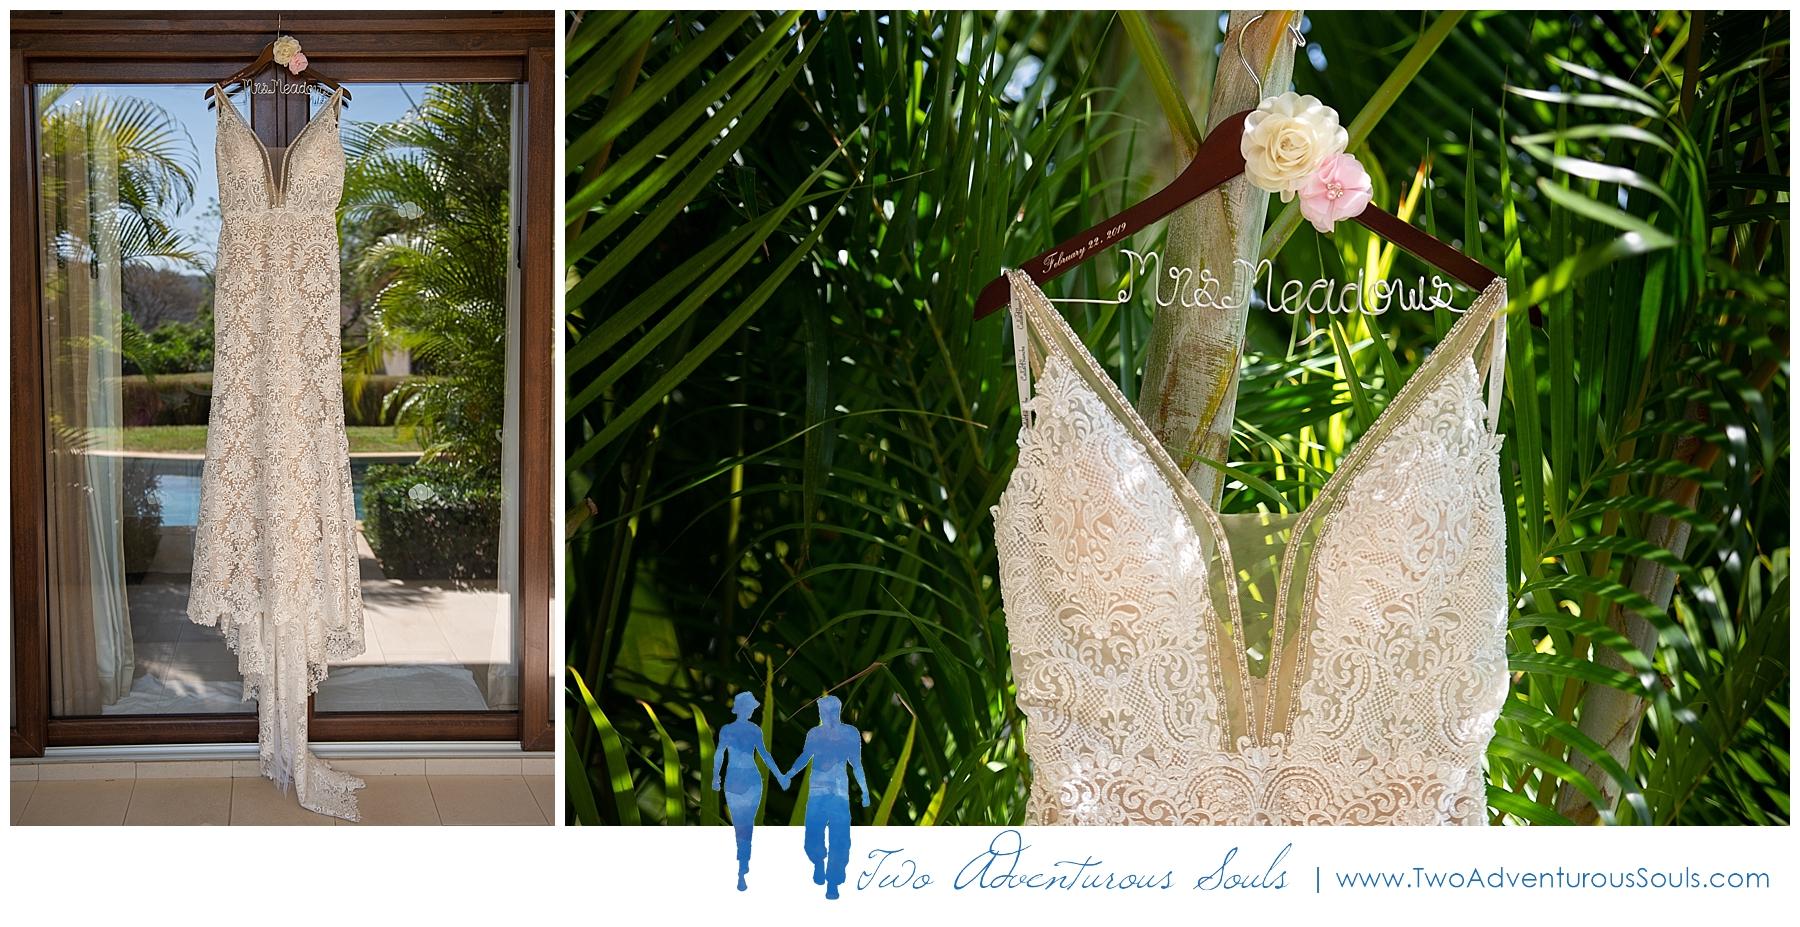 Costa Rica Wedding Photographers, Dreams las Mareas Wedding, Destination Wedding Photographers, Two Adventurous Souls - 022219_0001.jpg